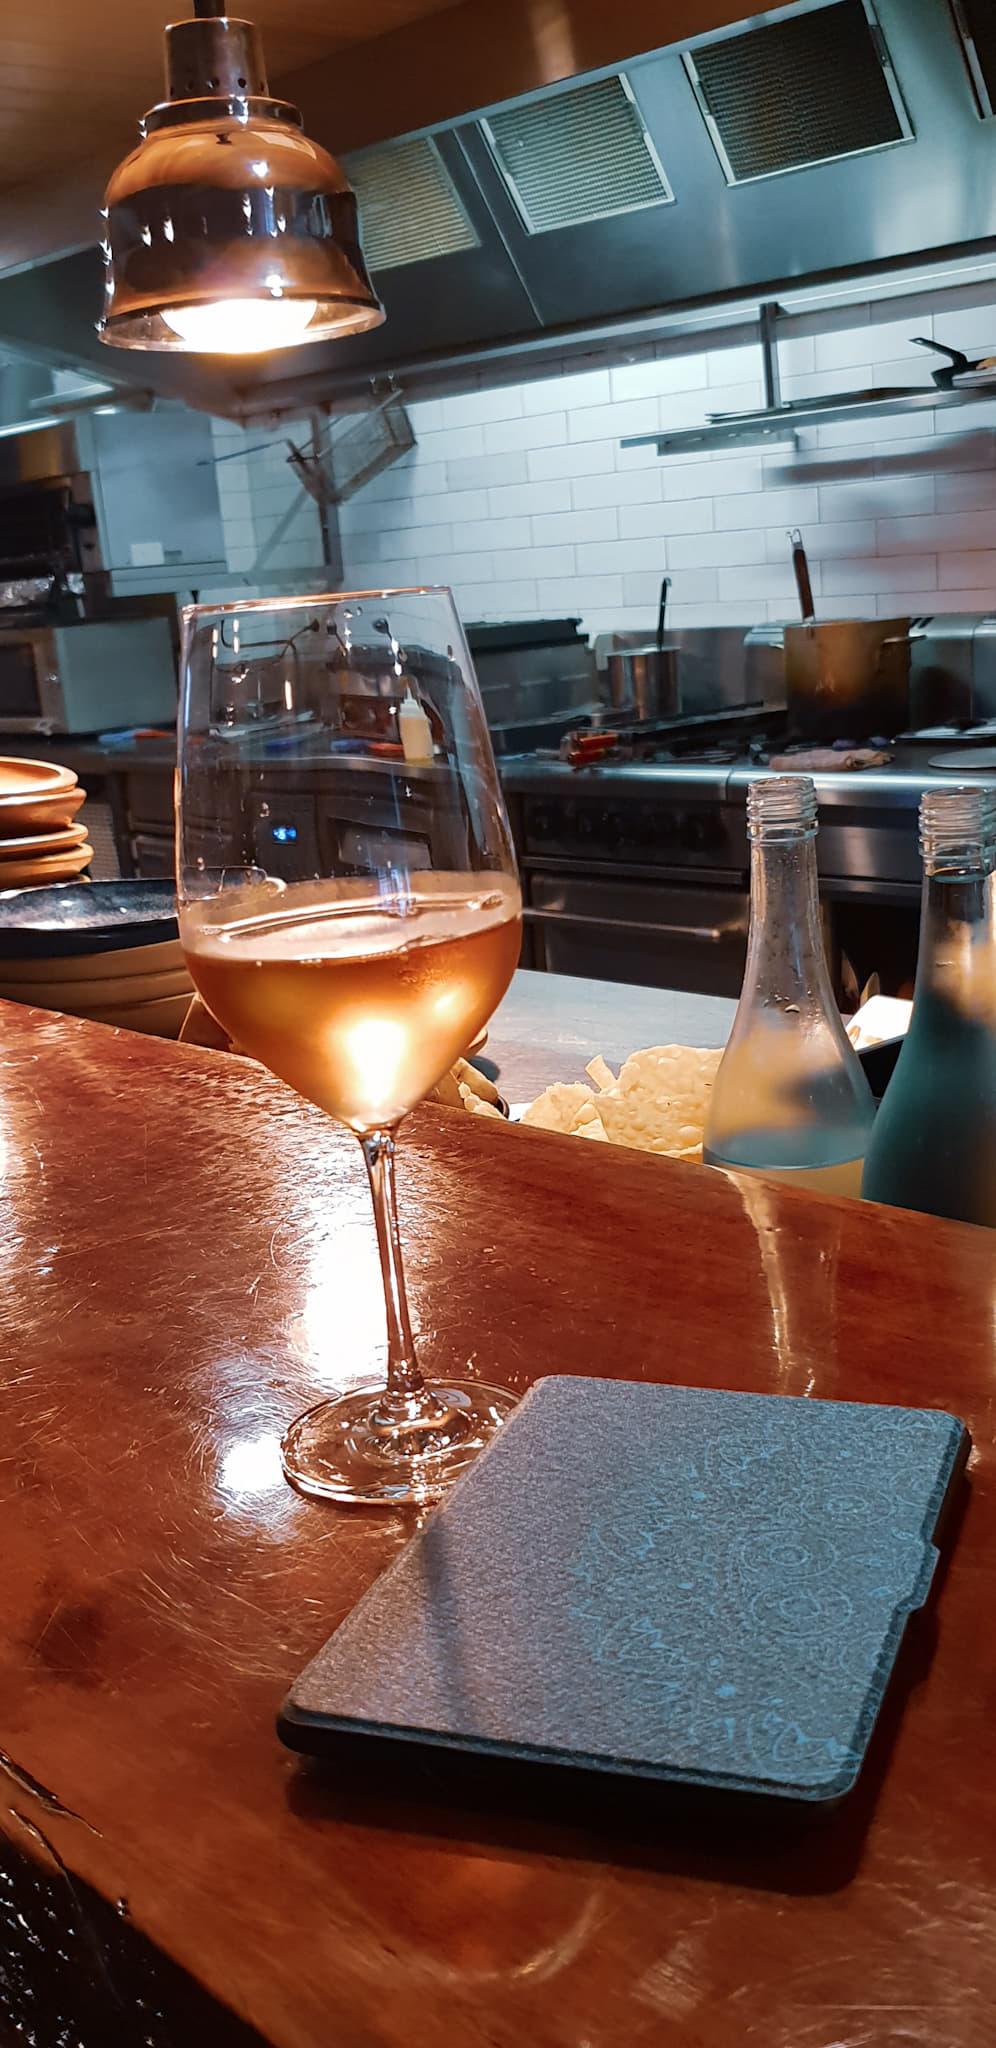 Wine and kindle times at Gogyo Surry Hills